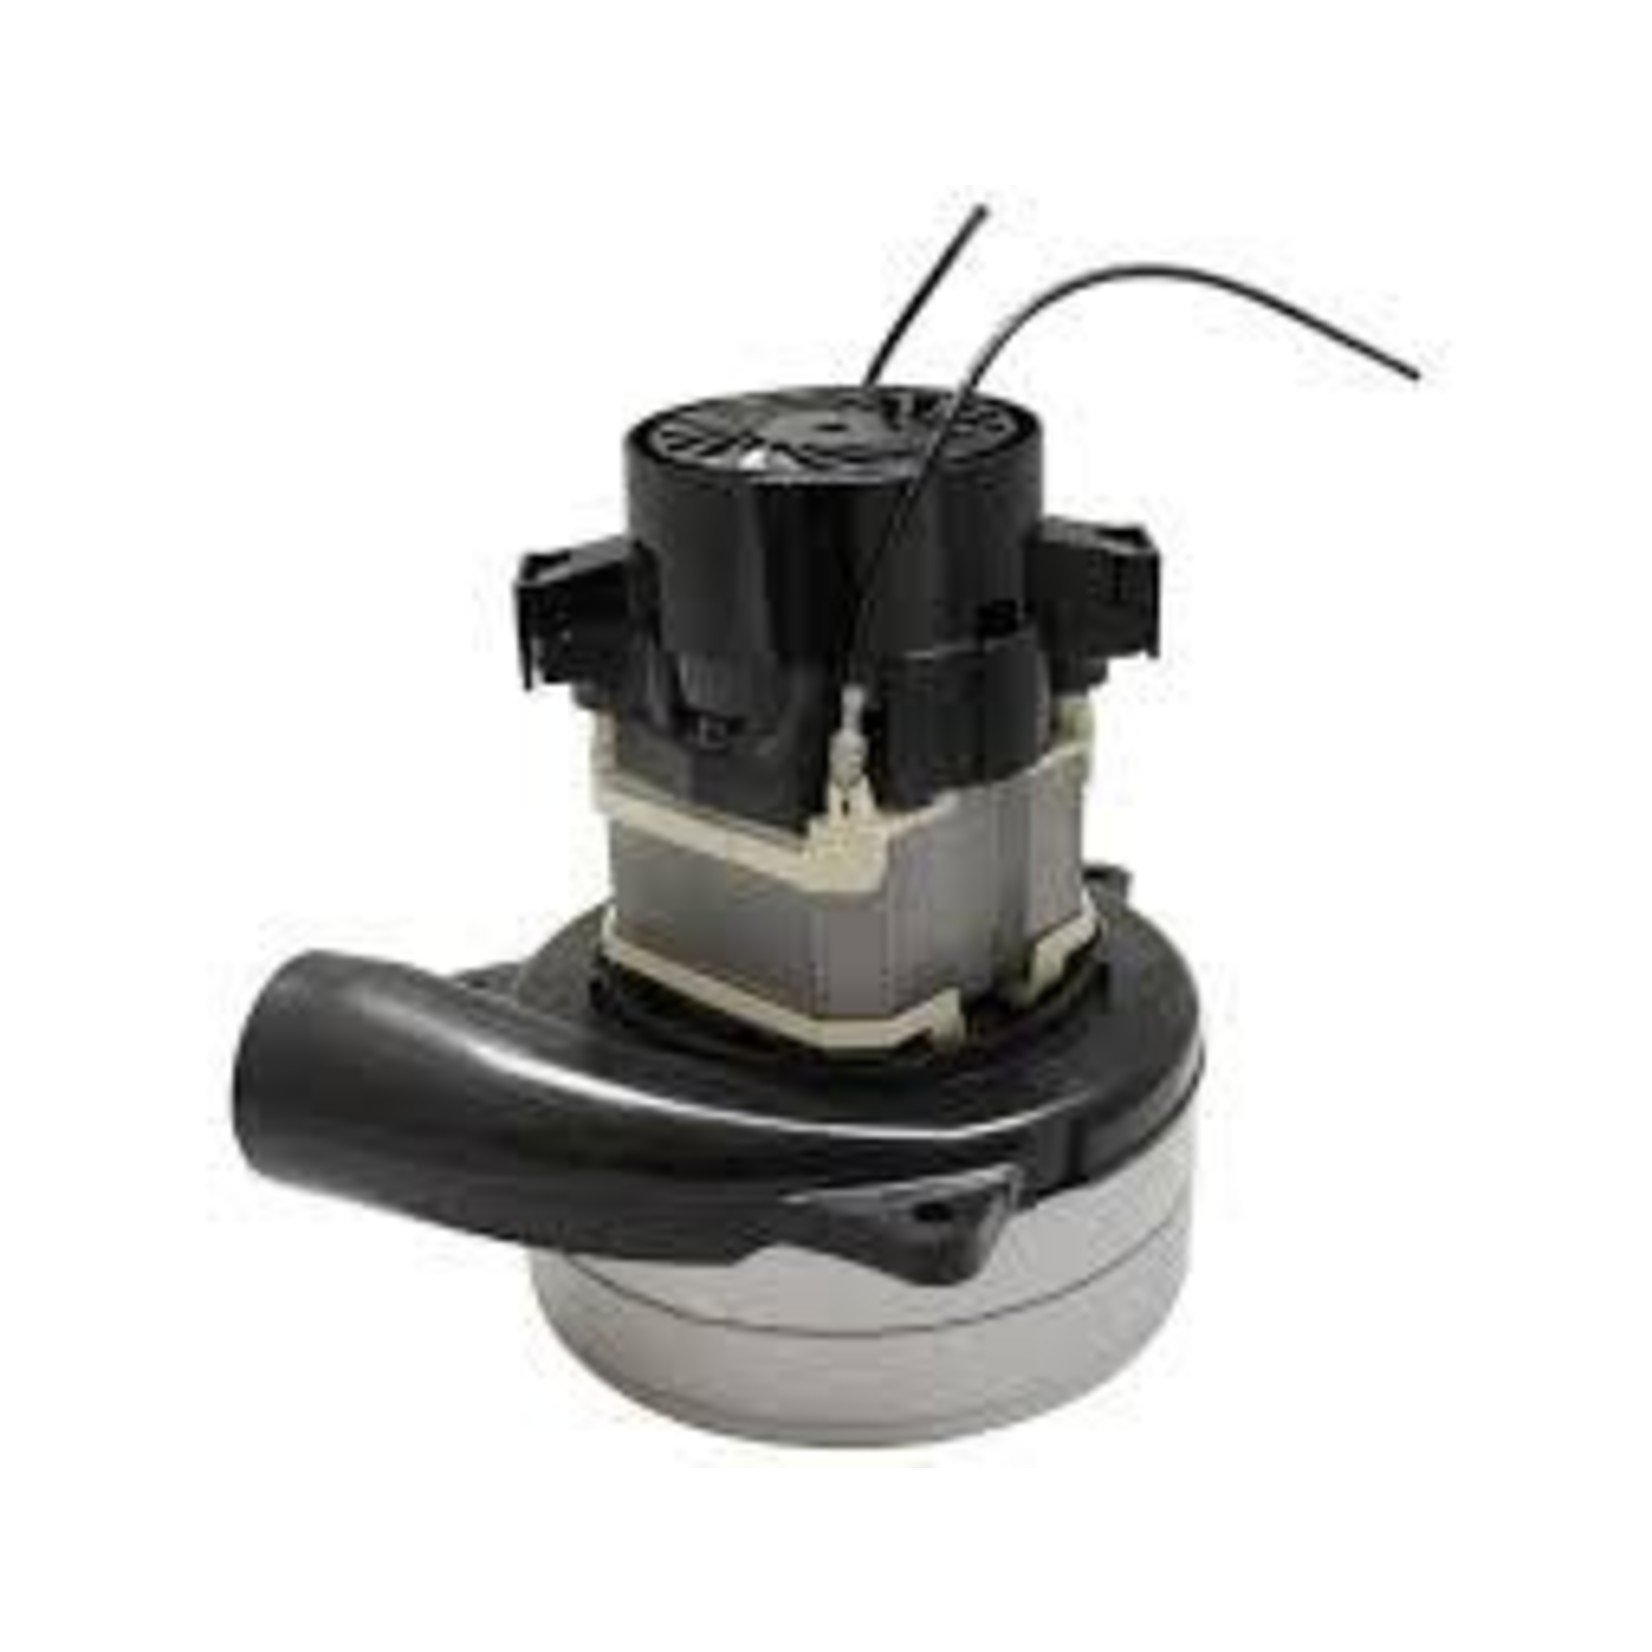 Lamb Electric Beam & Aggressor Lamb Motor - 119992.00